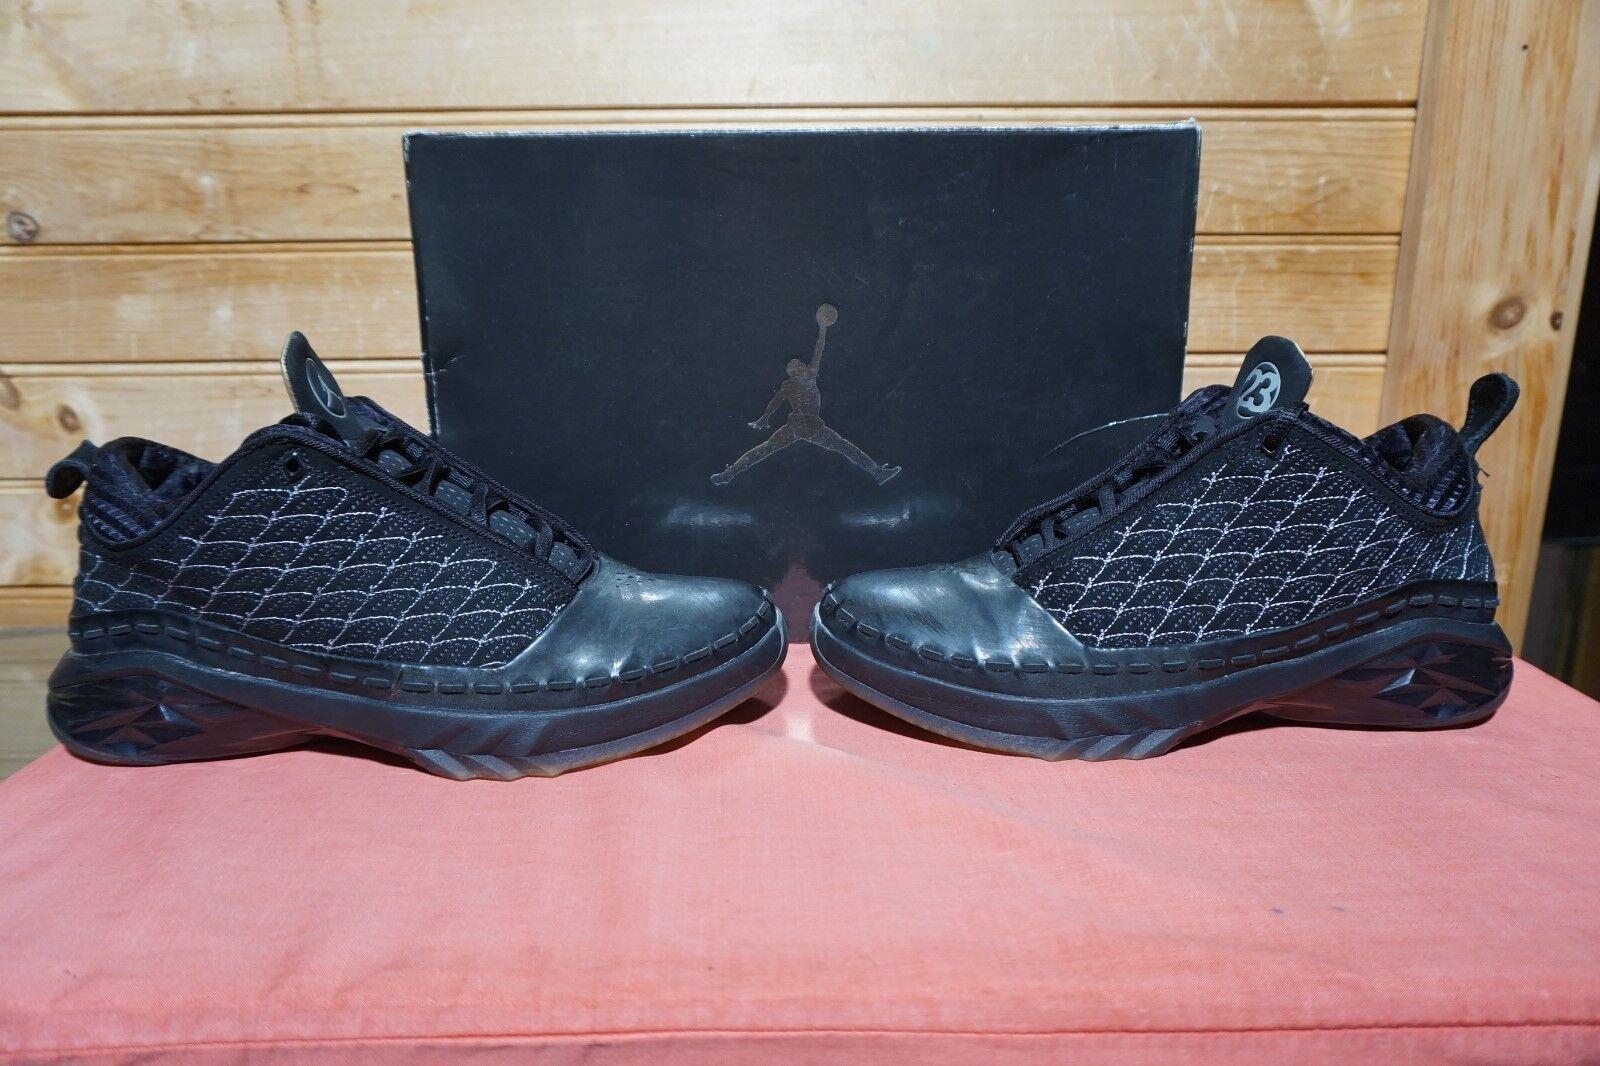 2008 Nike Air Jordan 23 Low Black Black Black Dark Charcoal Silver Sz 7.5 (0410) 323405-071 664fdc